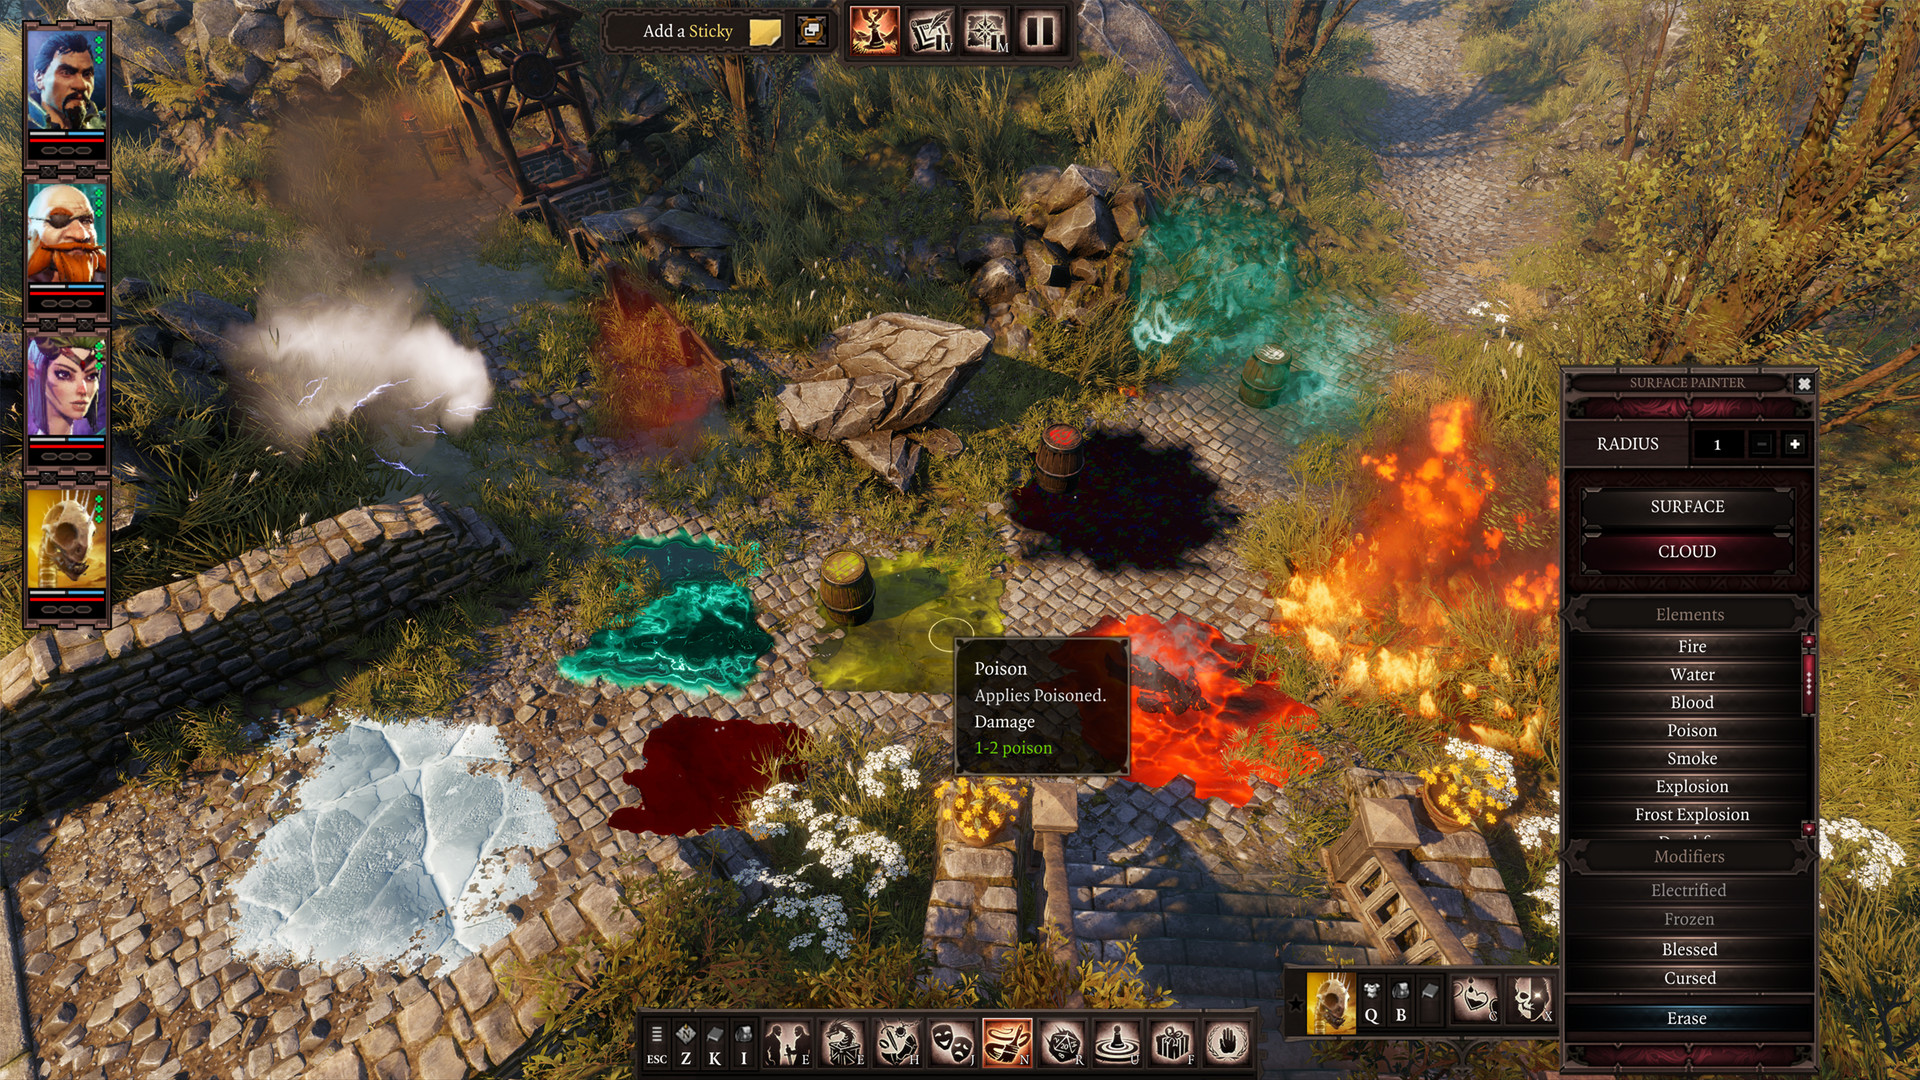 Save 60% on Divinity: Original Sin 2 - Definitive Edition on Steam